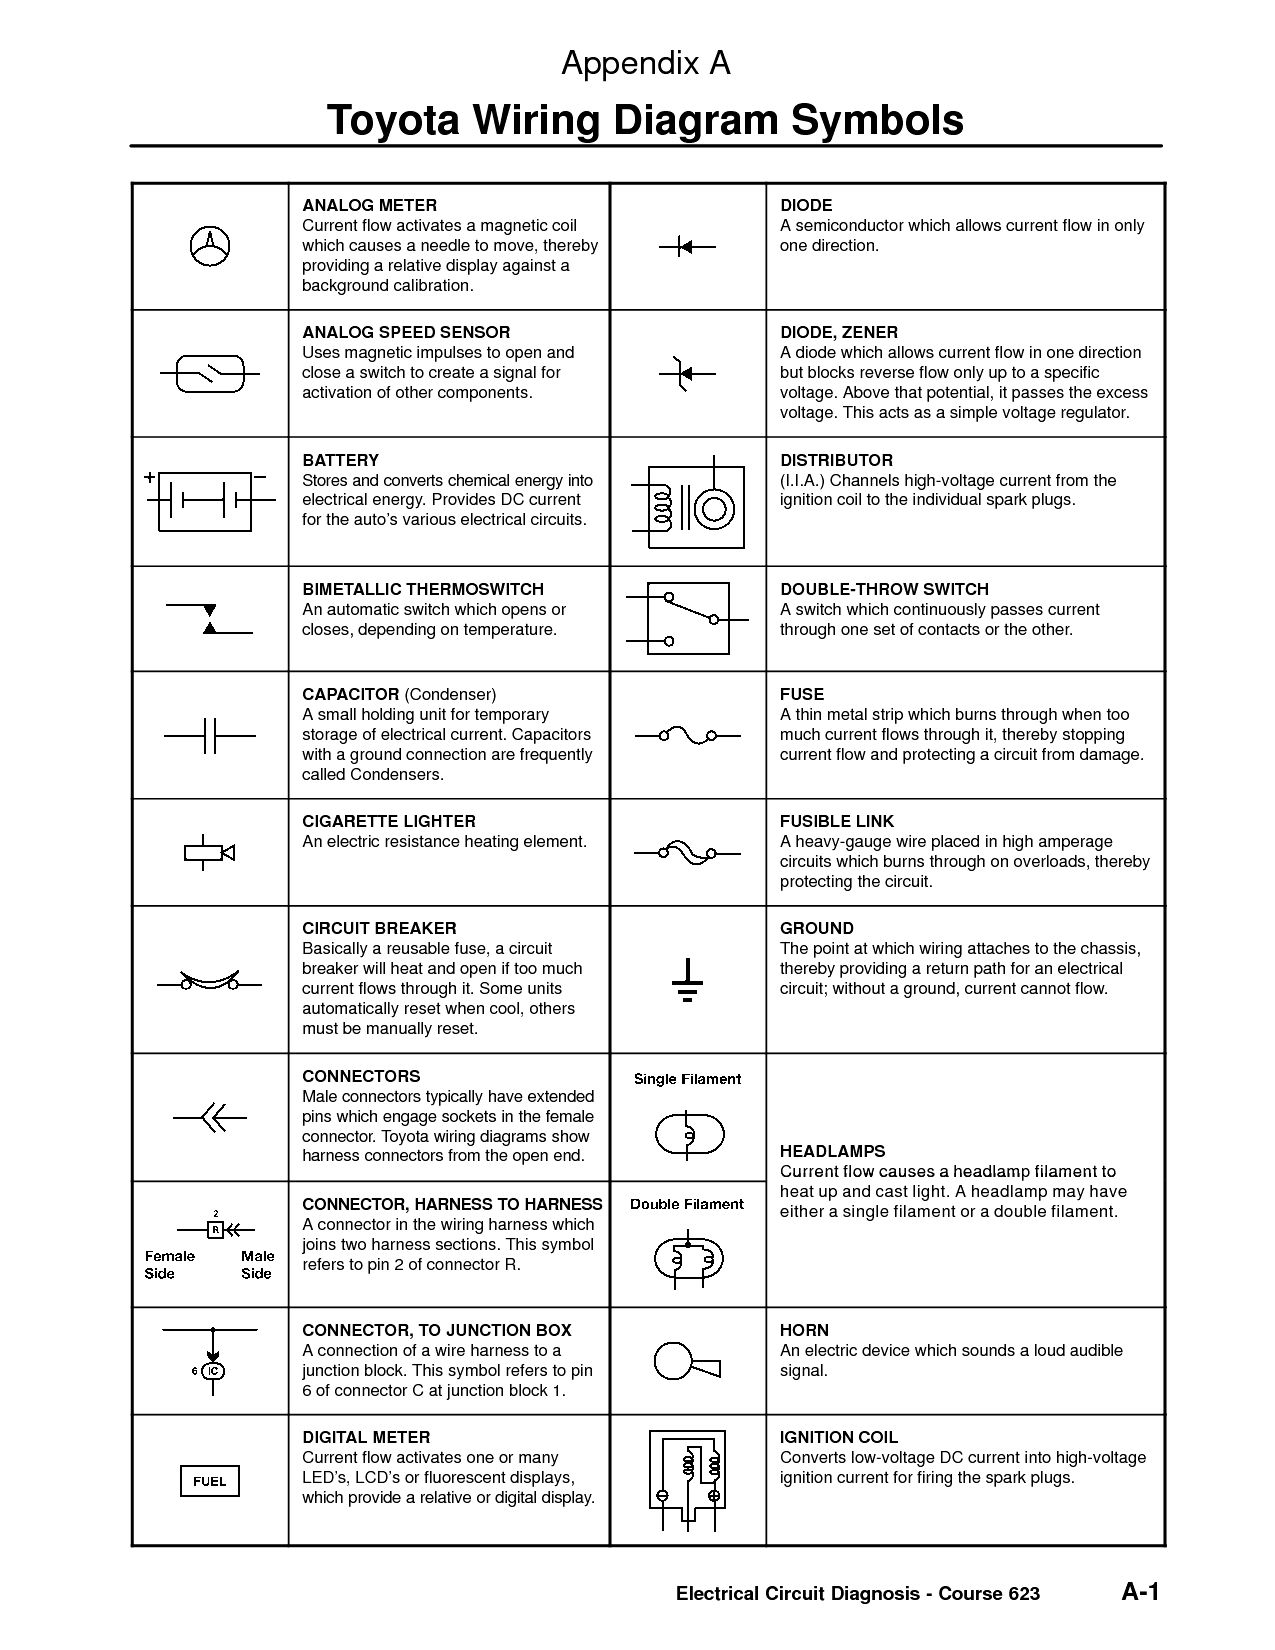 Fantastic Electrical Wiring Schematic Symbols Basic Electronics Wiring Diagram Wiring Cloud Intelaidewilluminateatxorg